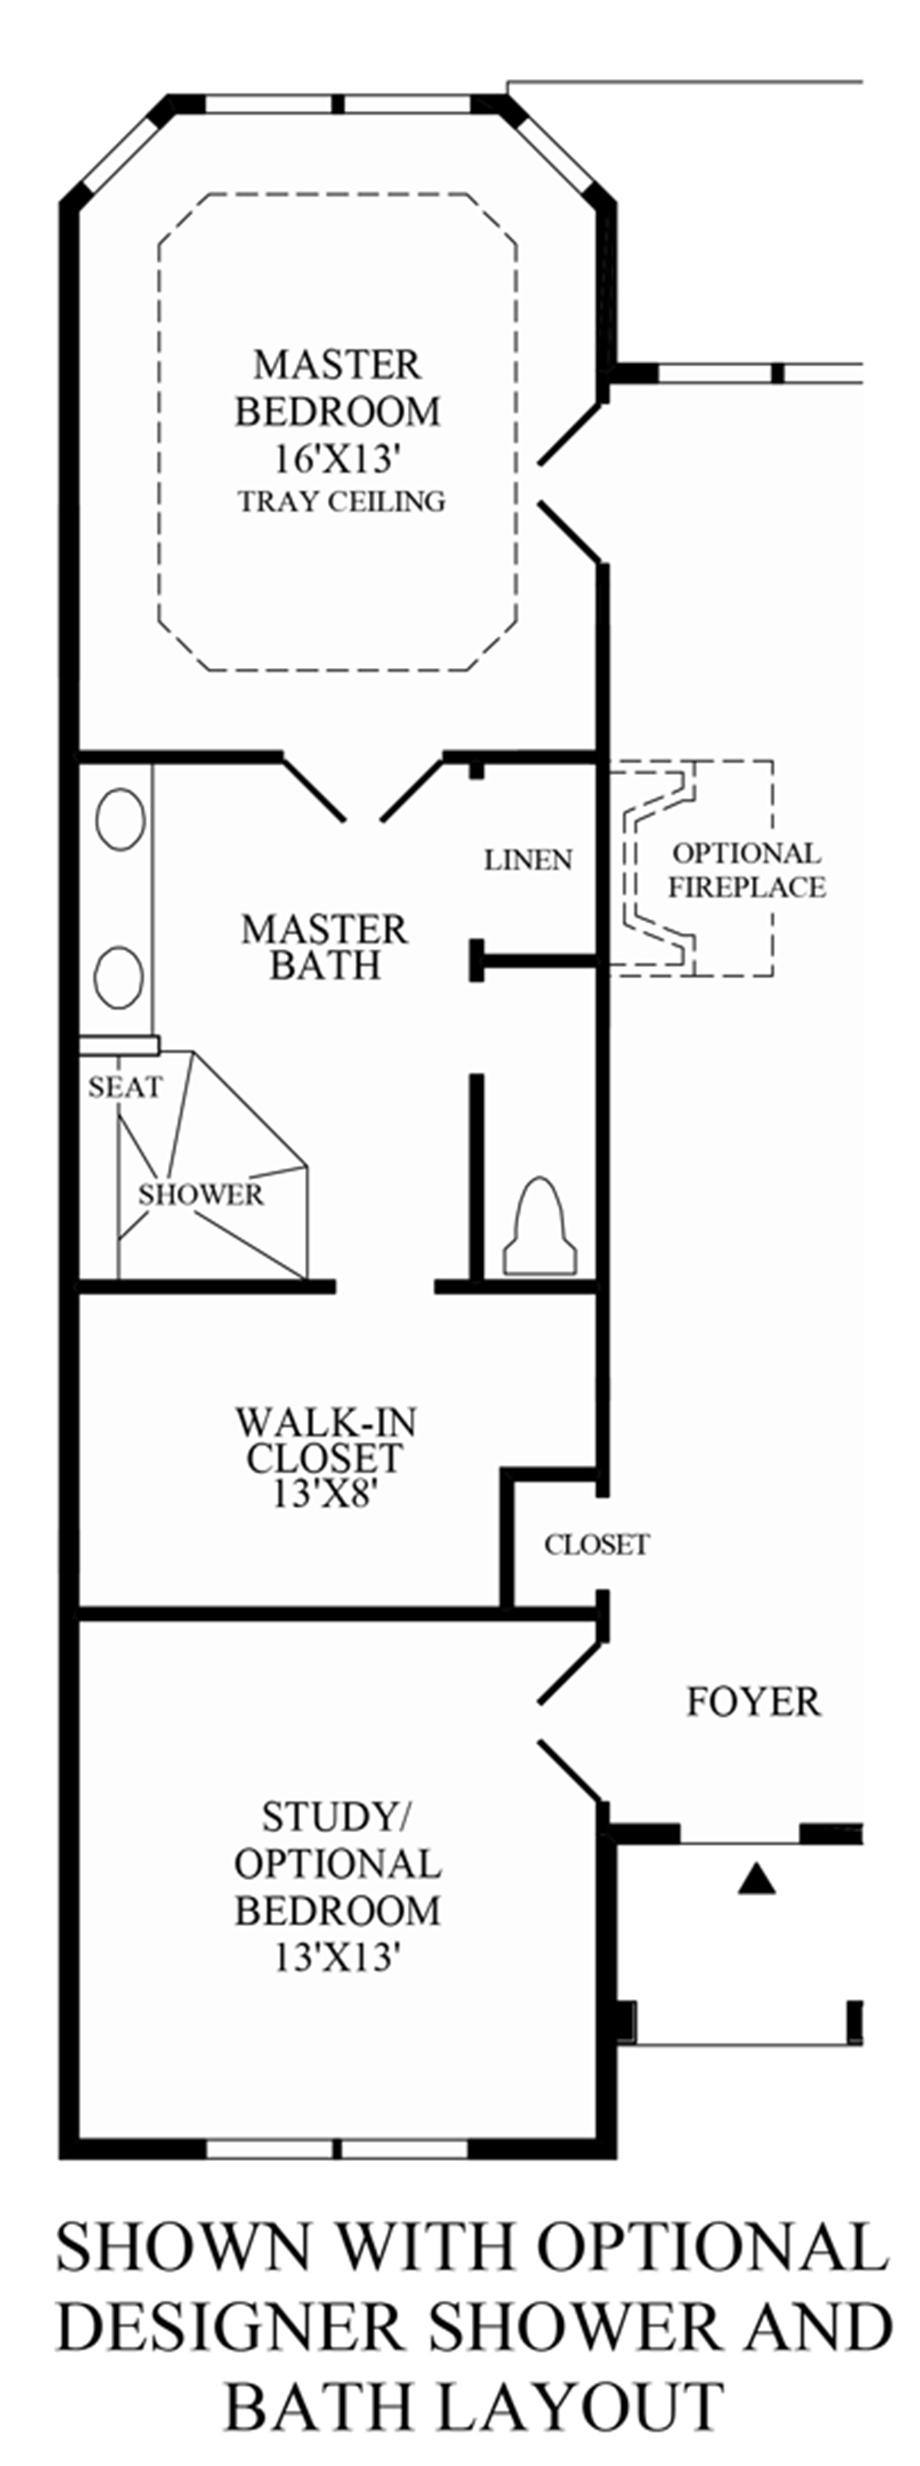 Optional Designer Shower & Bath Layout Floor Plan